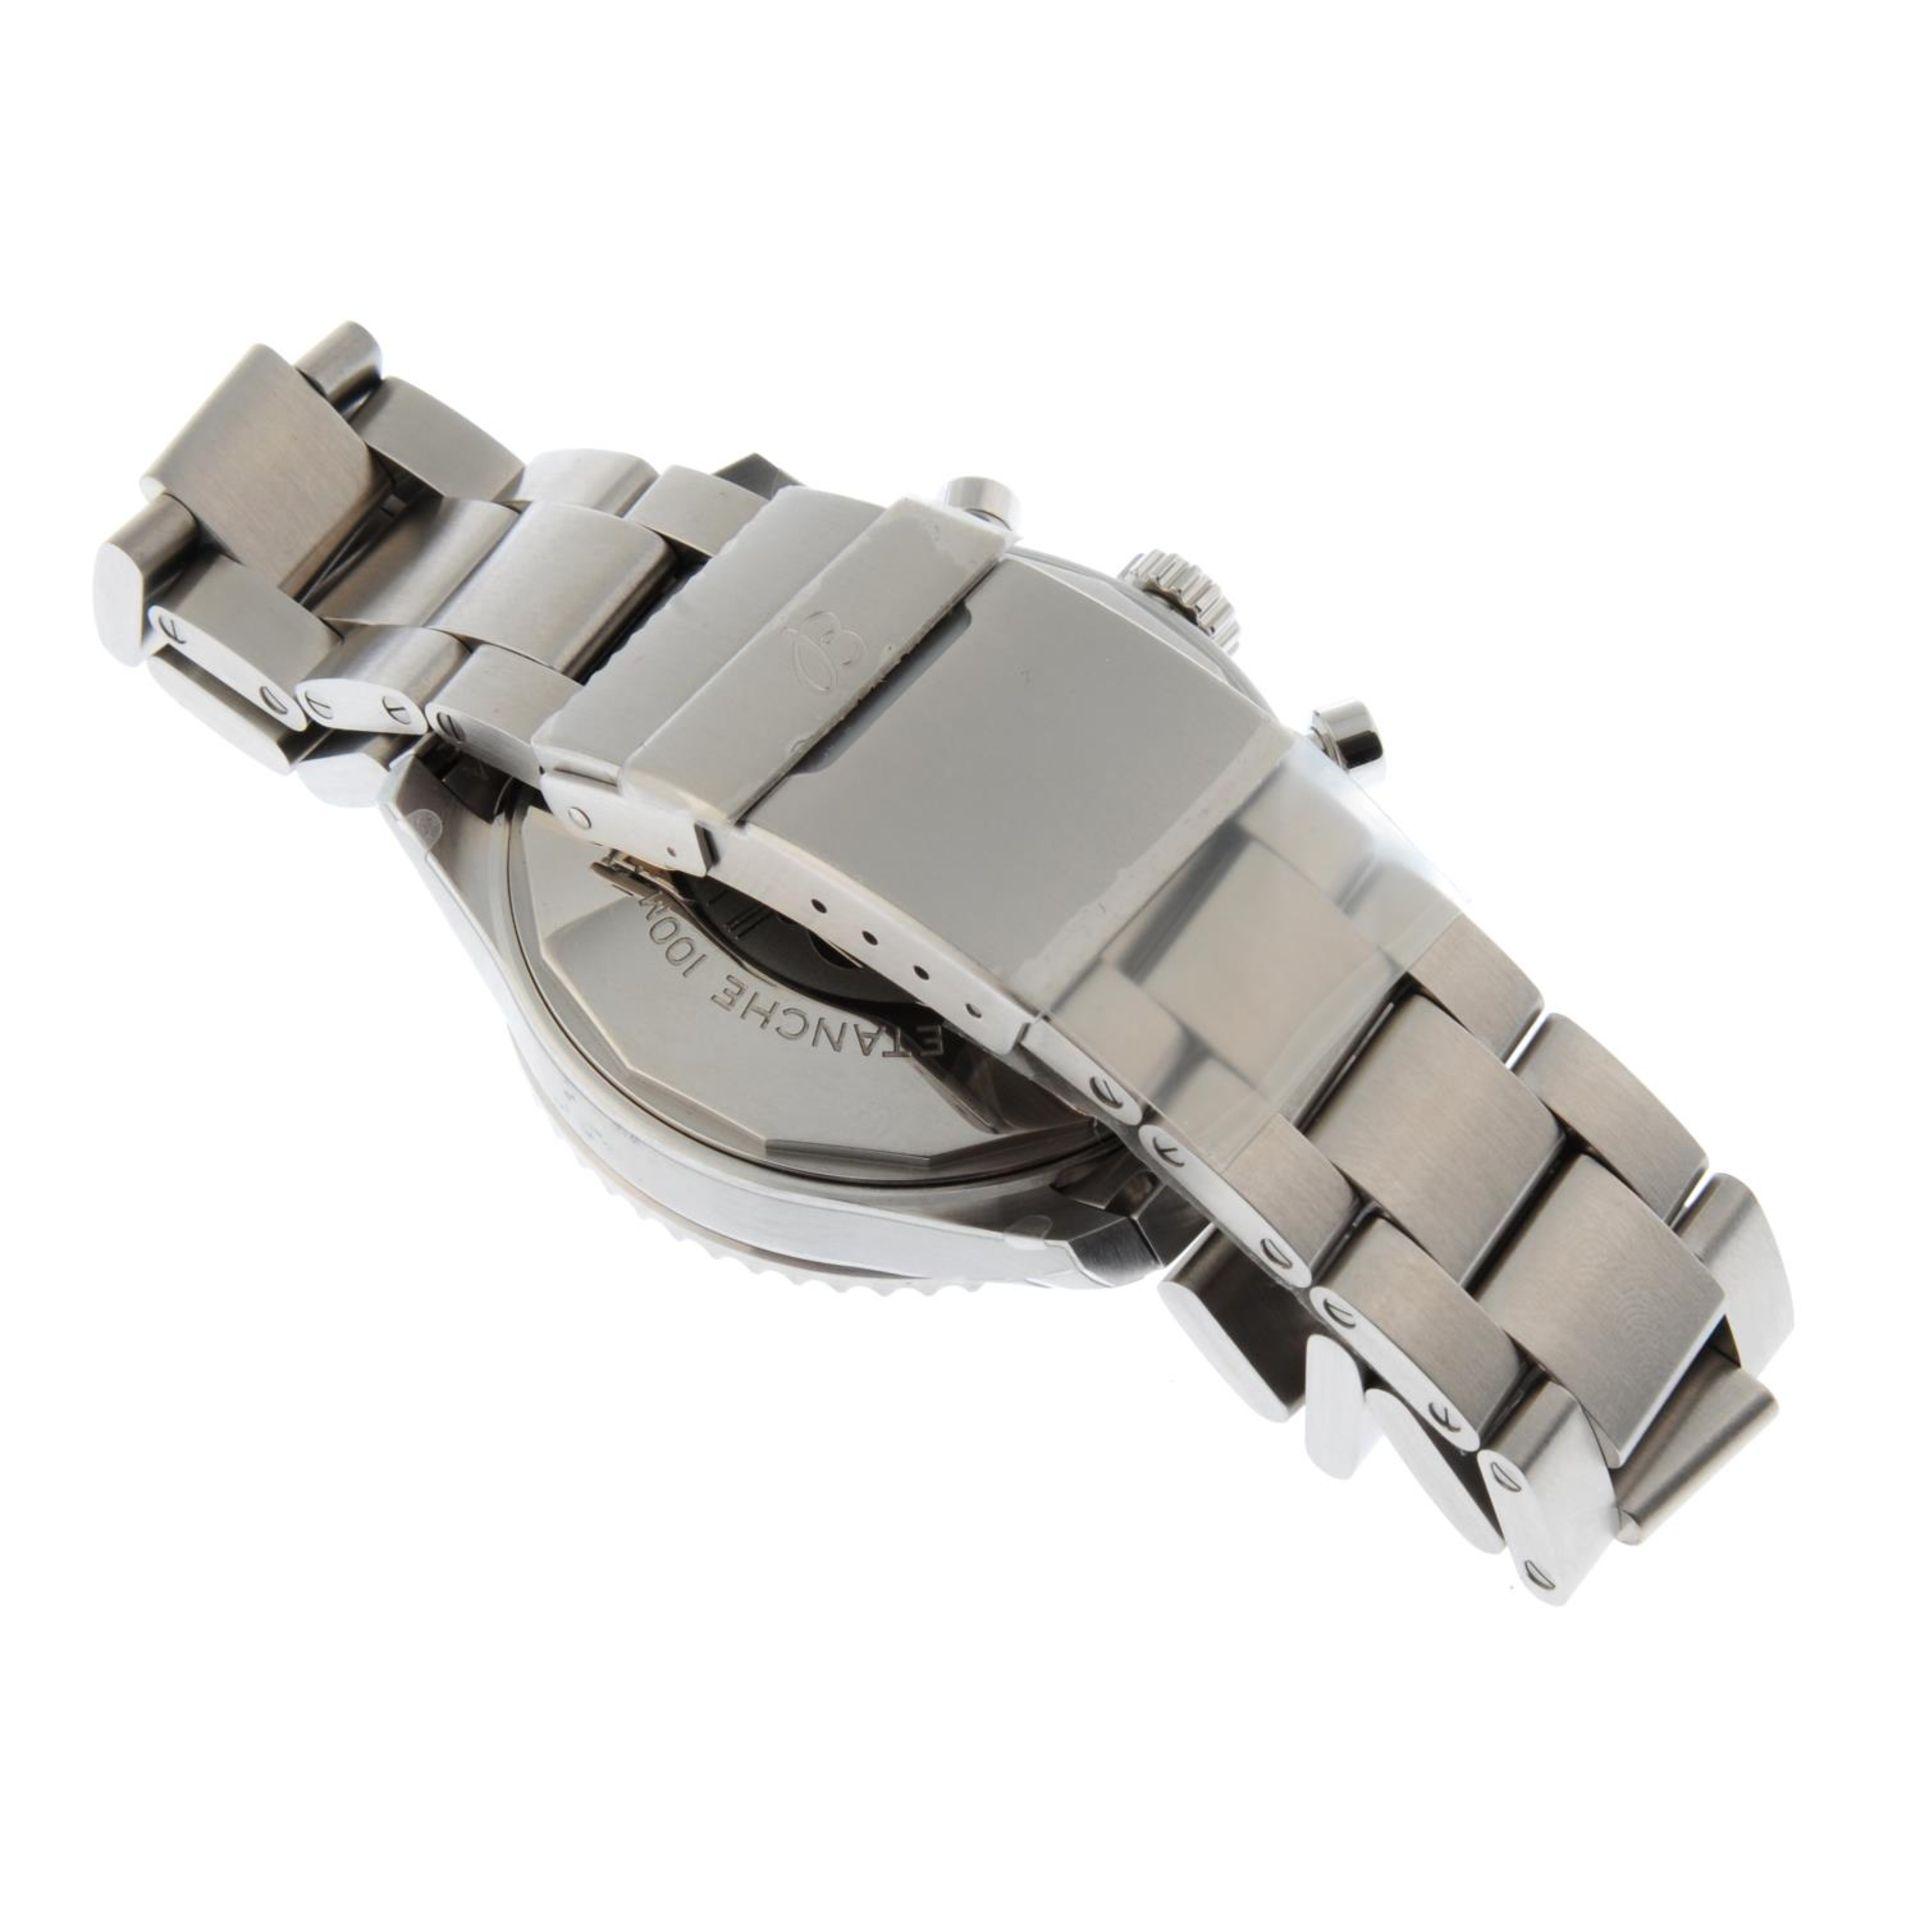 CURRENT MODEL: BREITLING - an Aviator 8 chronograph bracelet watch. - Bild 4 aus 6